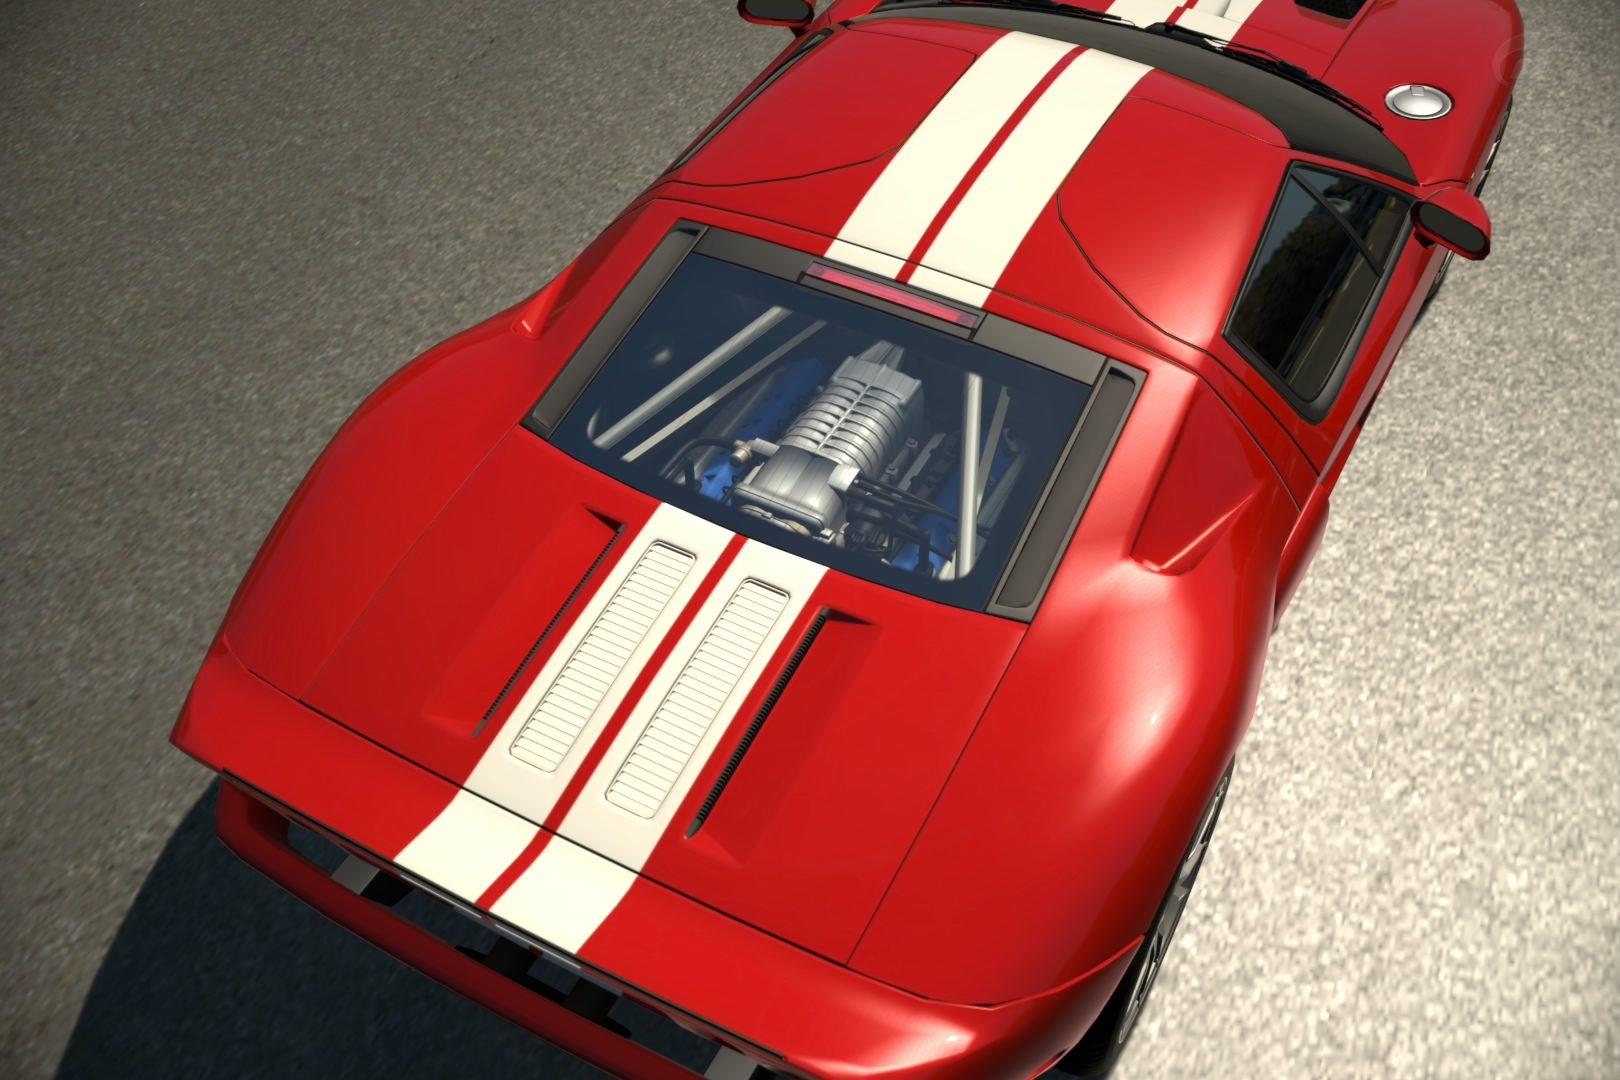 FordGT06Img2.jpg